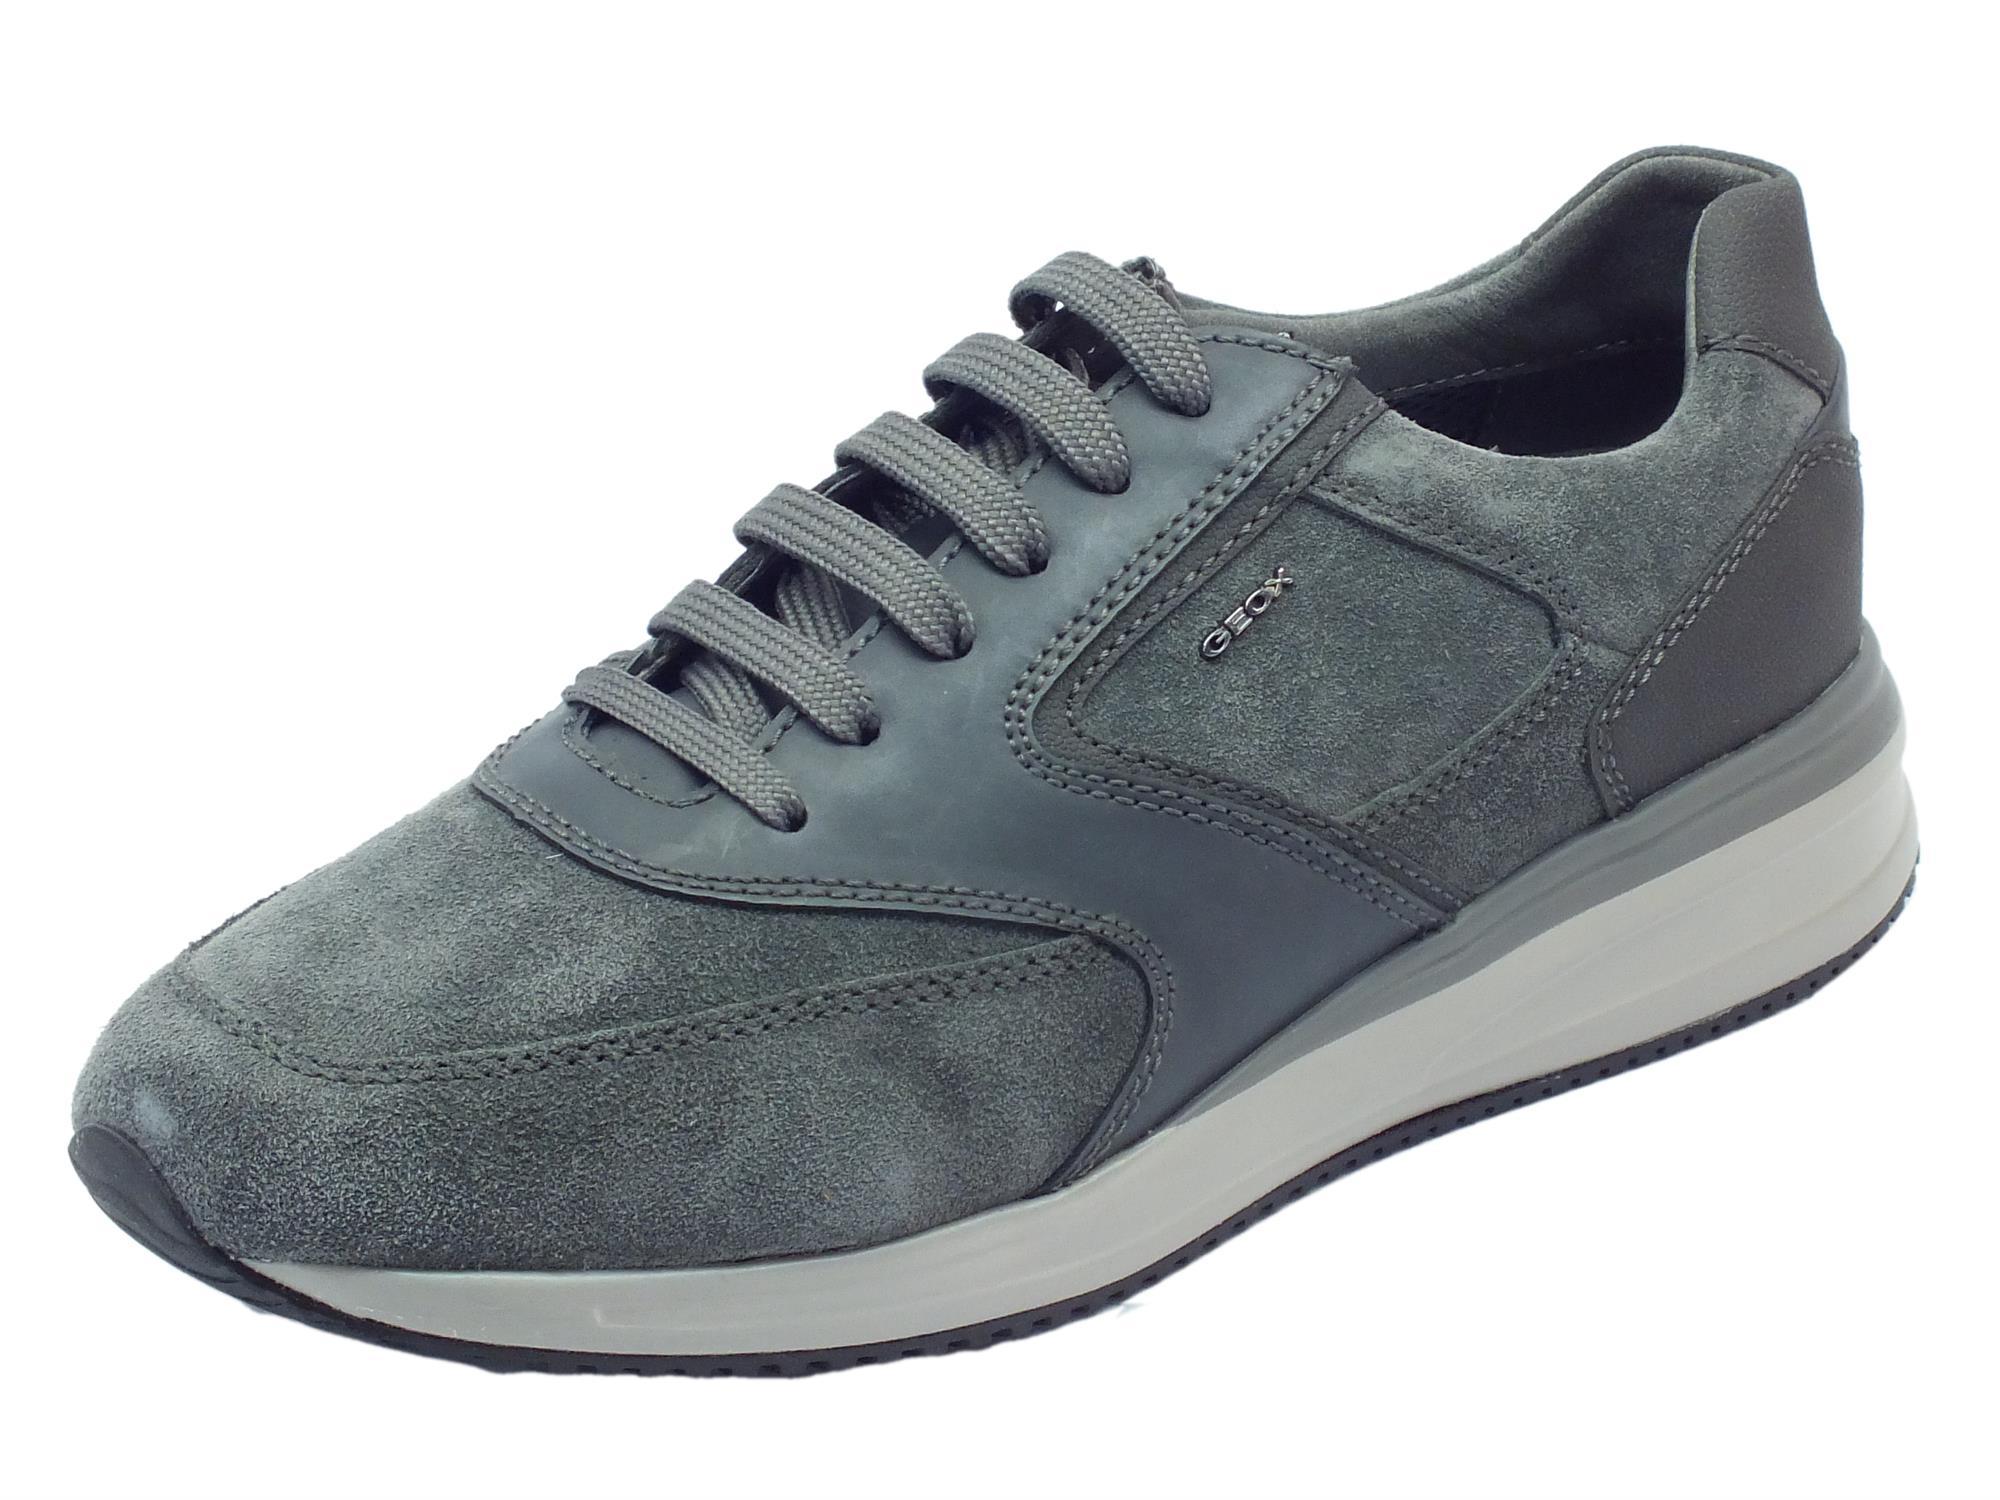 Clarks Originals Donna Verde Pallido tela Desert Boots UK 6 ... d1297efec2d